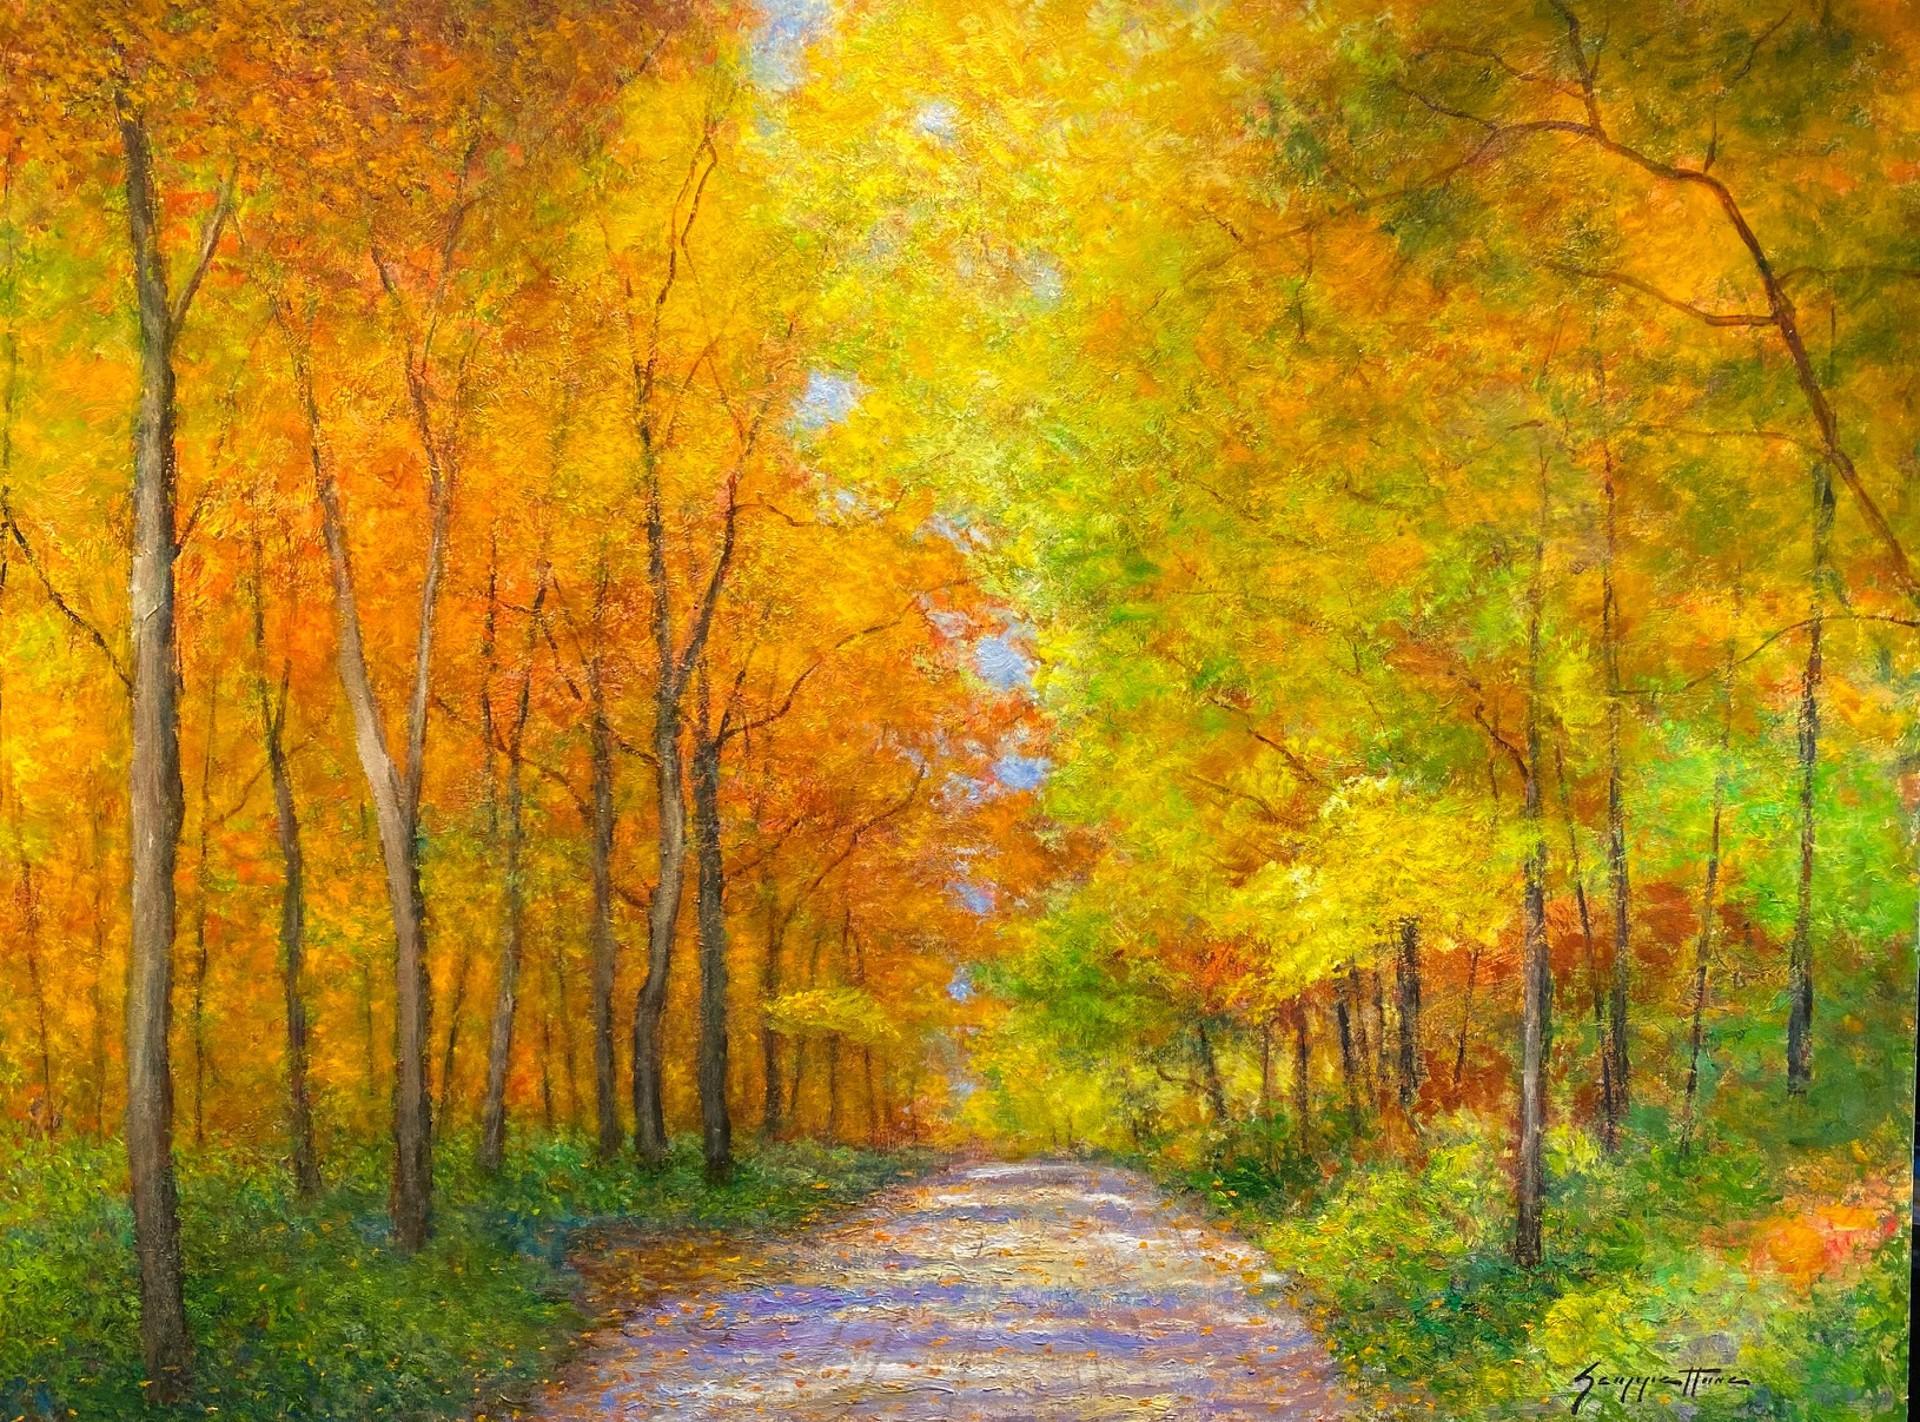 An Autumn Lane II by James Scoppettone